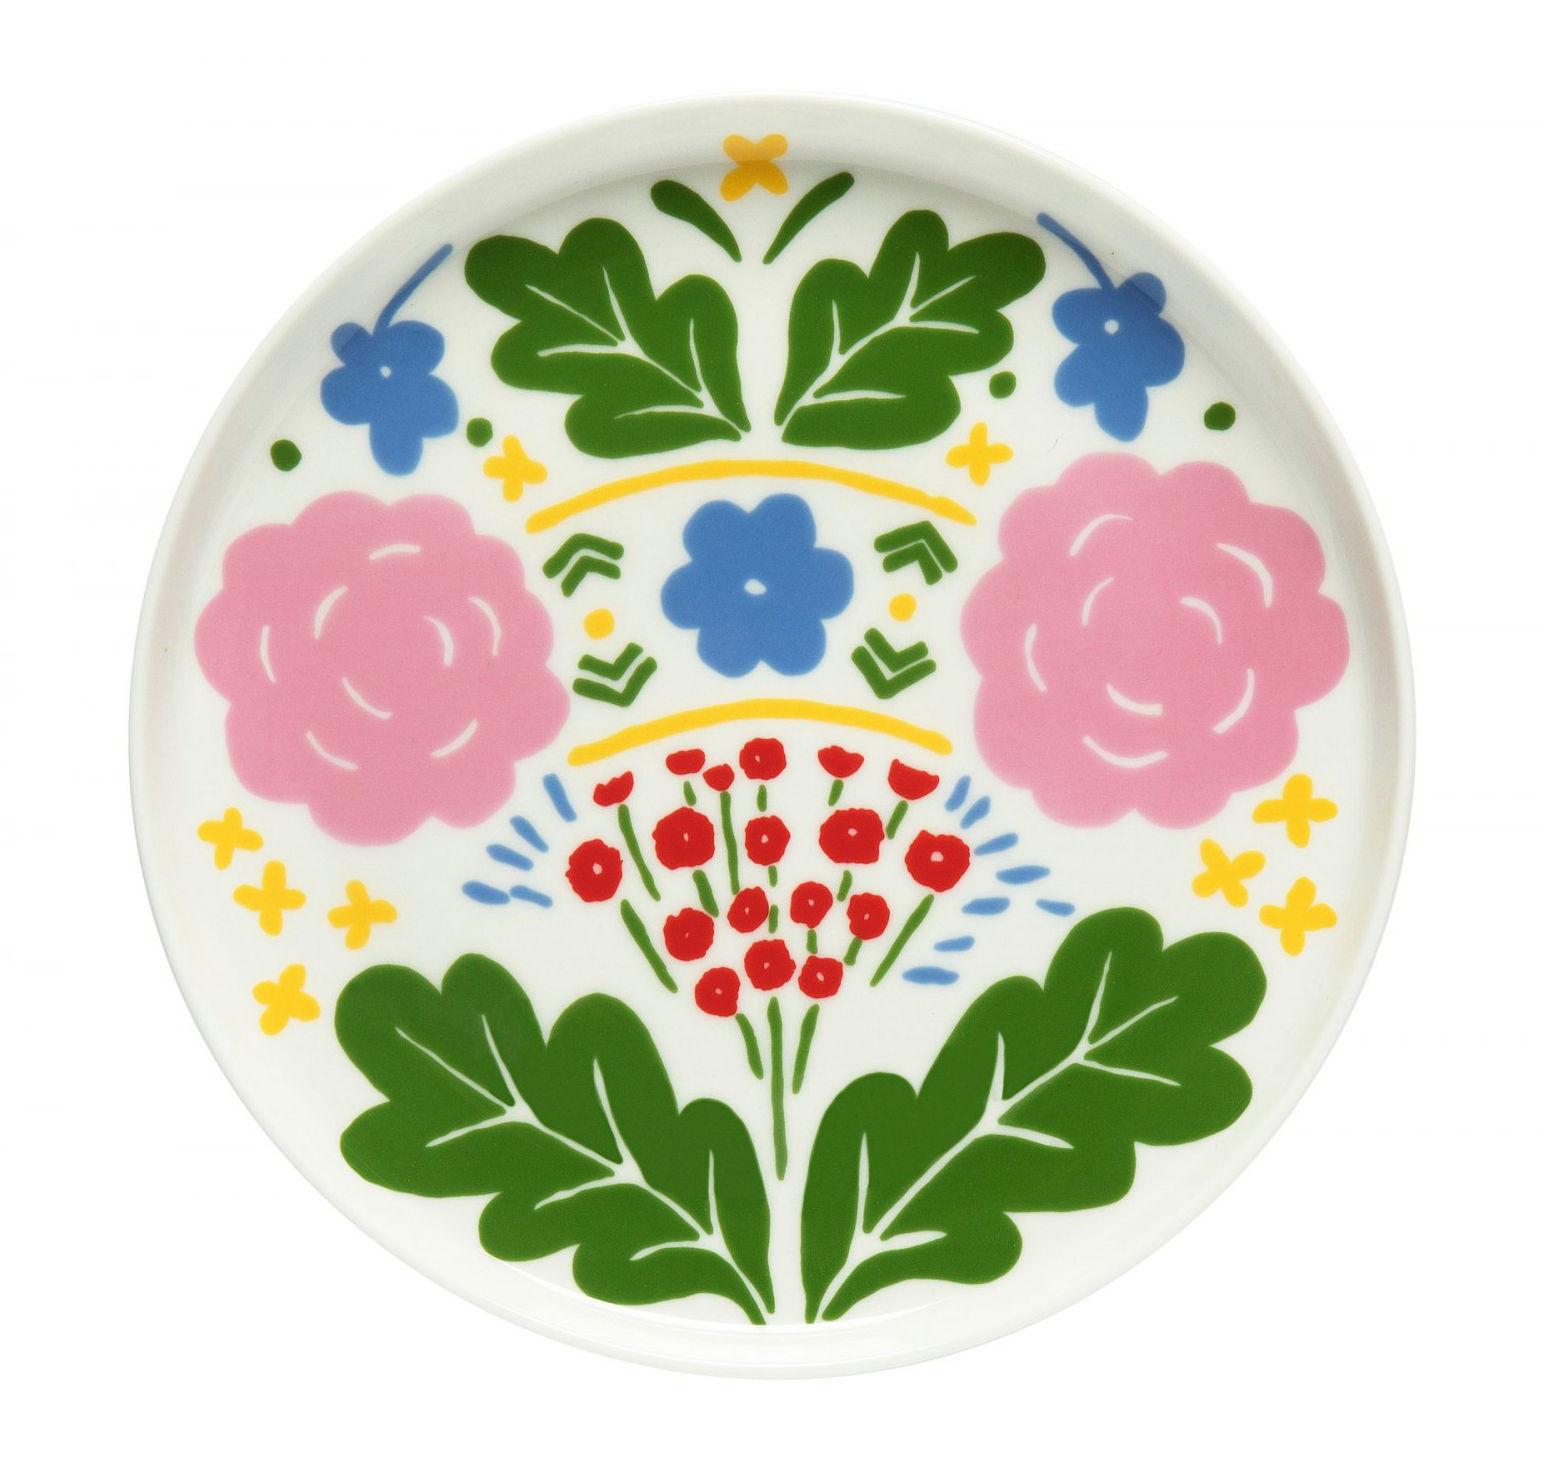 Tableware - Plates - Onni Dessert plate - / Ø 20 cm by Marimekko - Onni / Green, blue & pink - Sandstone